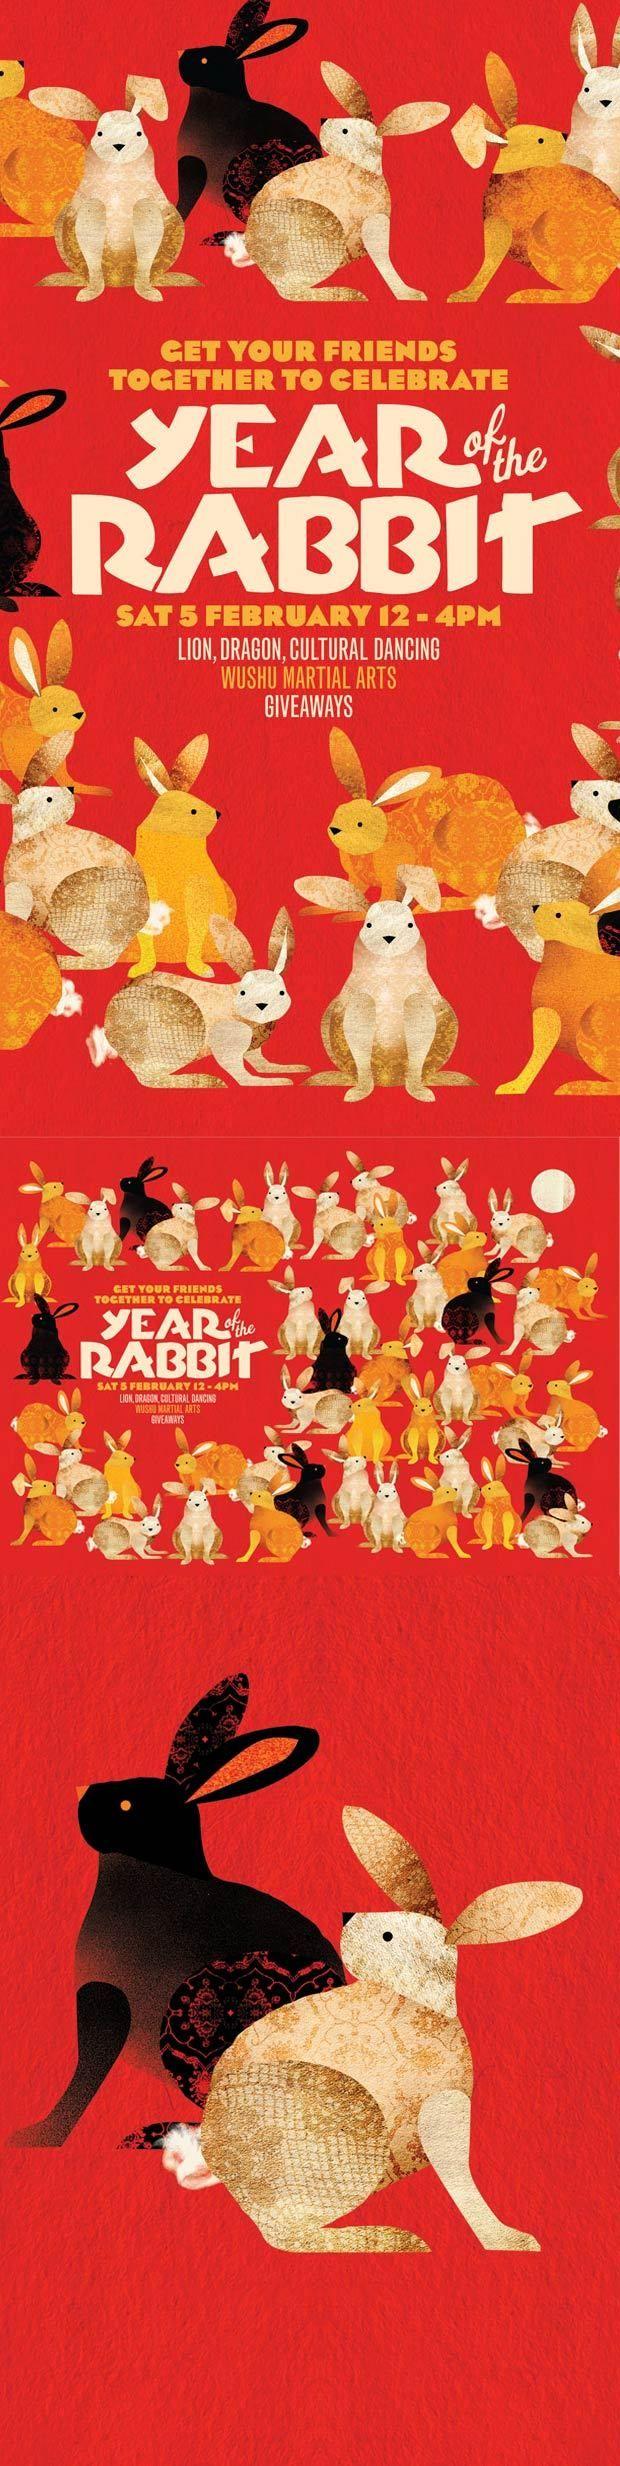 Chinese New Year Poster - WBYK